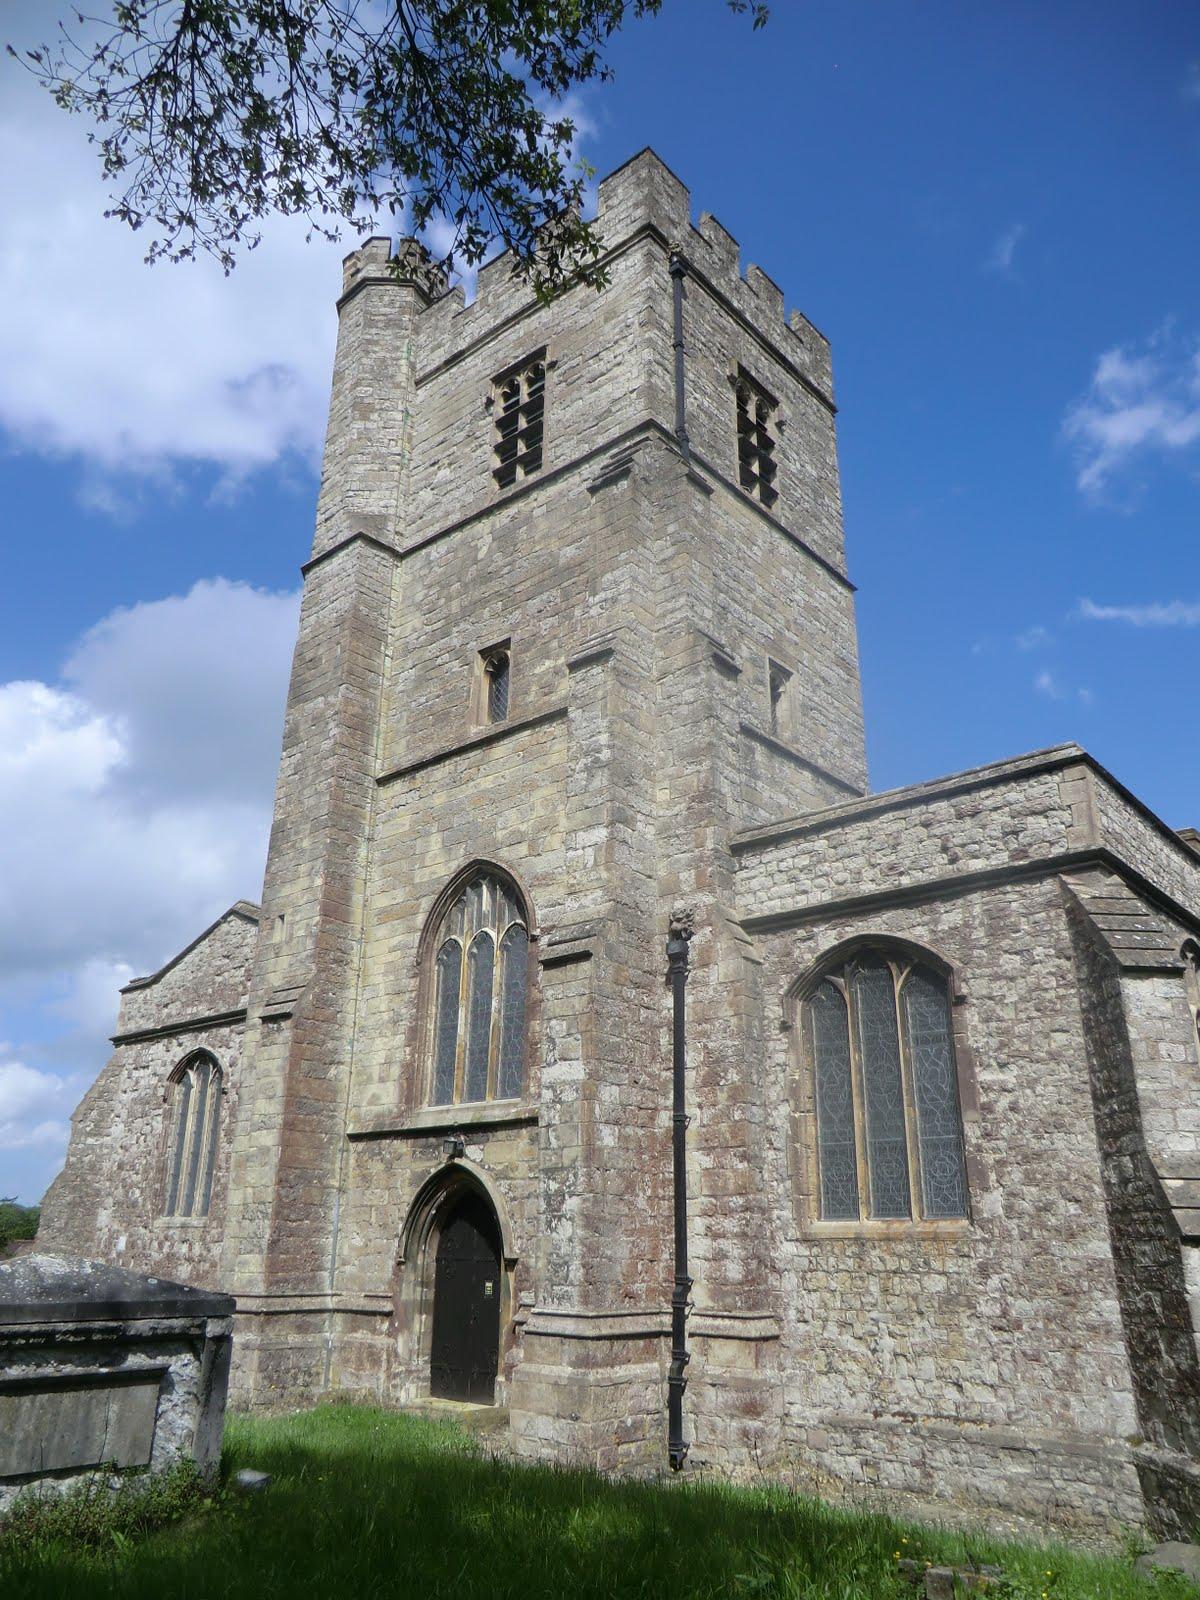 CIMG3003 St Mary Magdalene church, Cobham